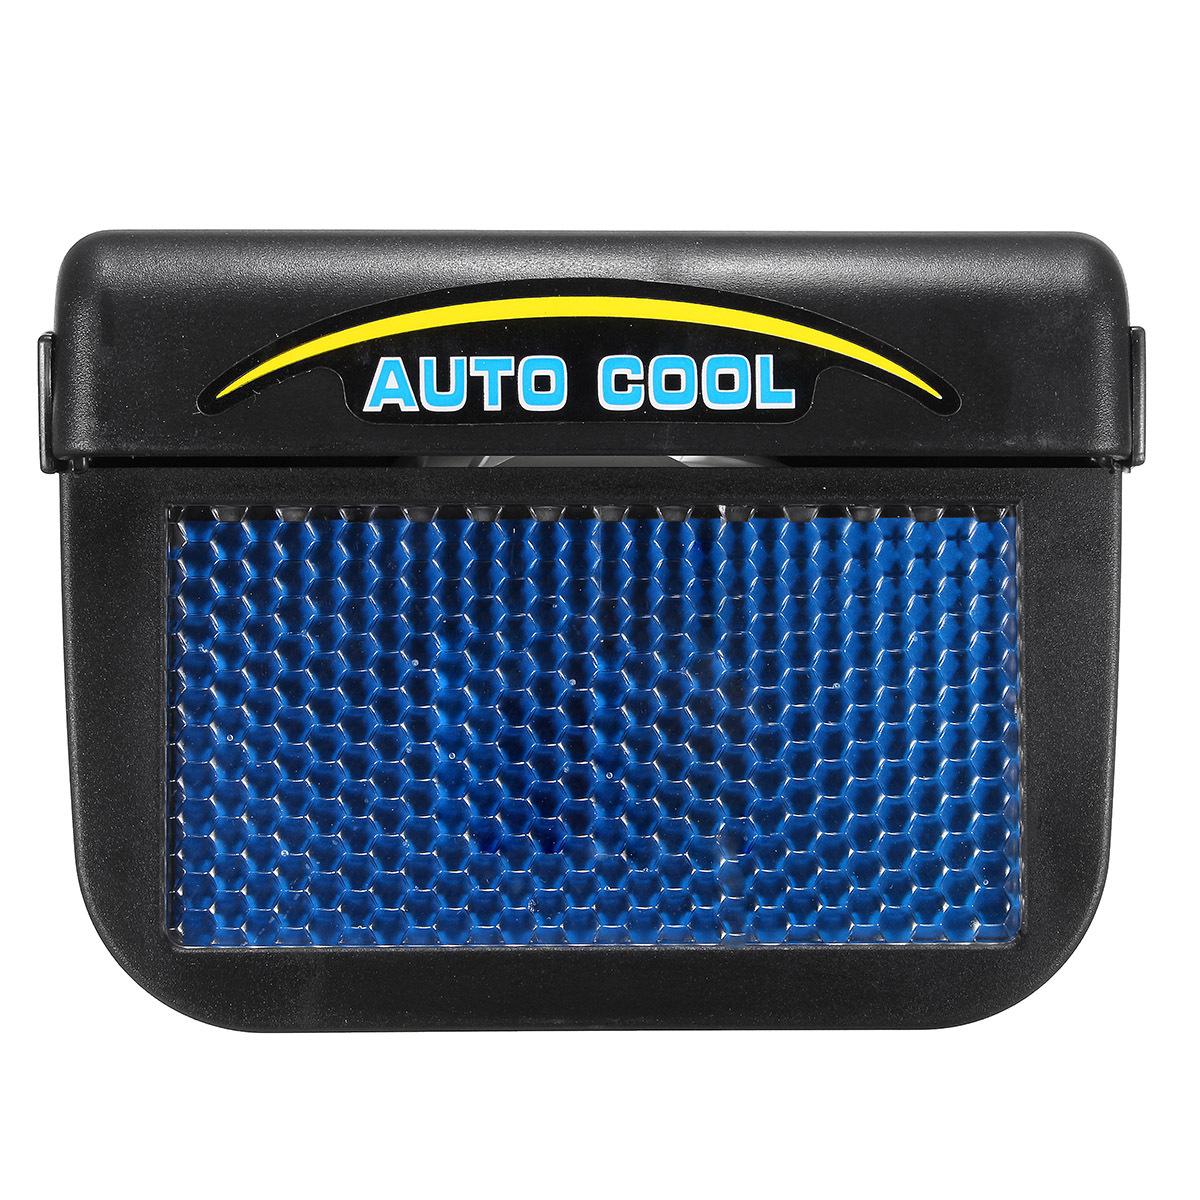 solar power car window fan auto ventilator cooling vehicle air vent portable jsd ebay. Black Bedroom Furniture Sets. Home Design Ideas